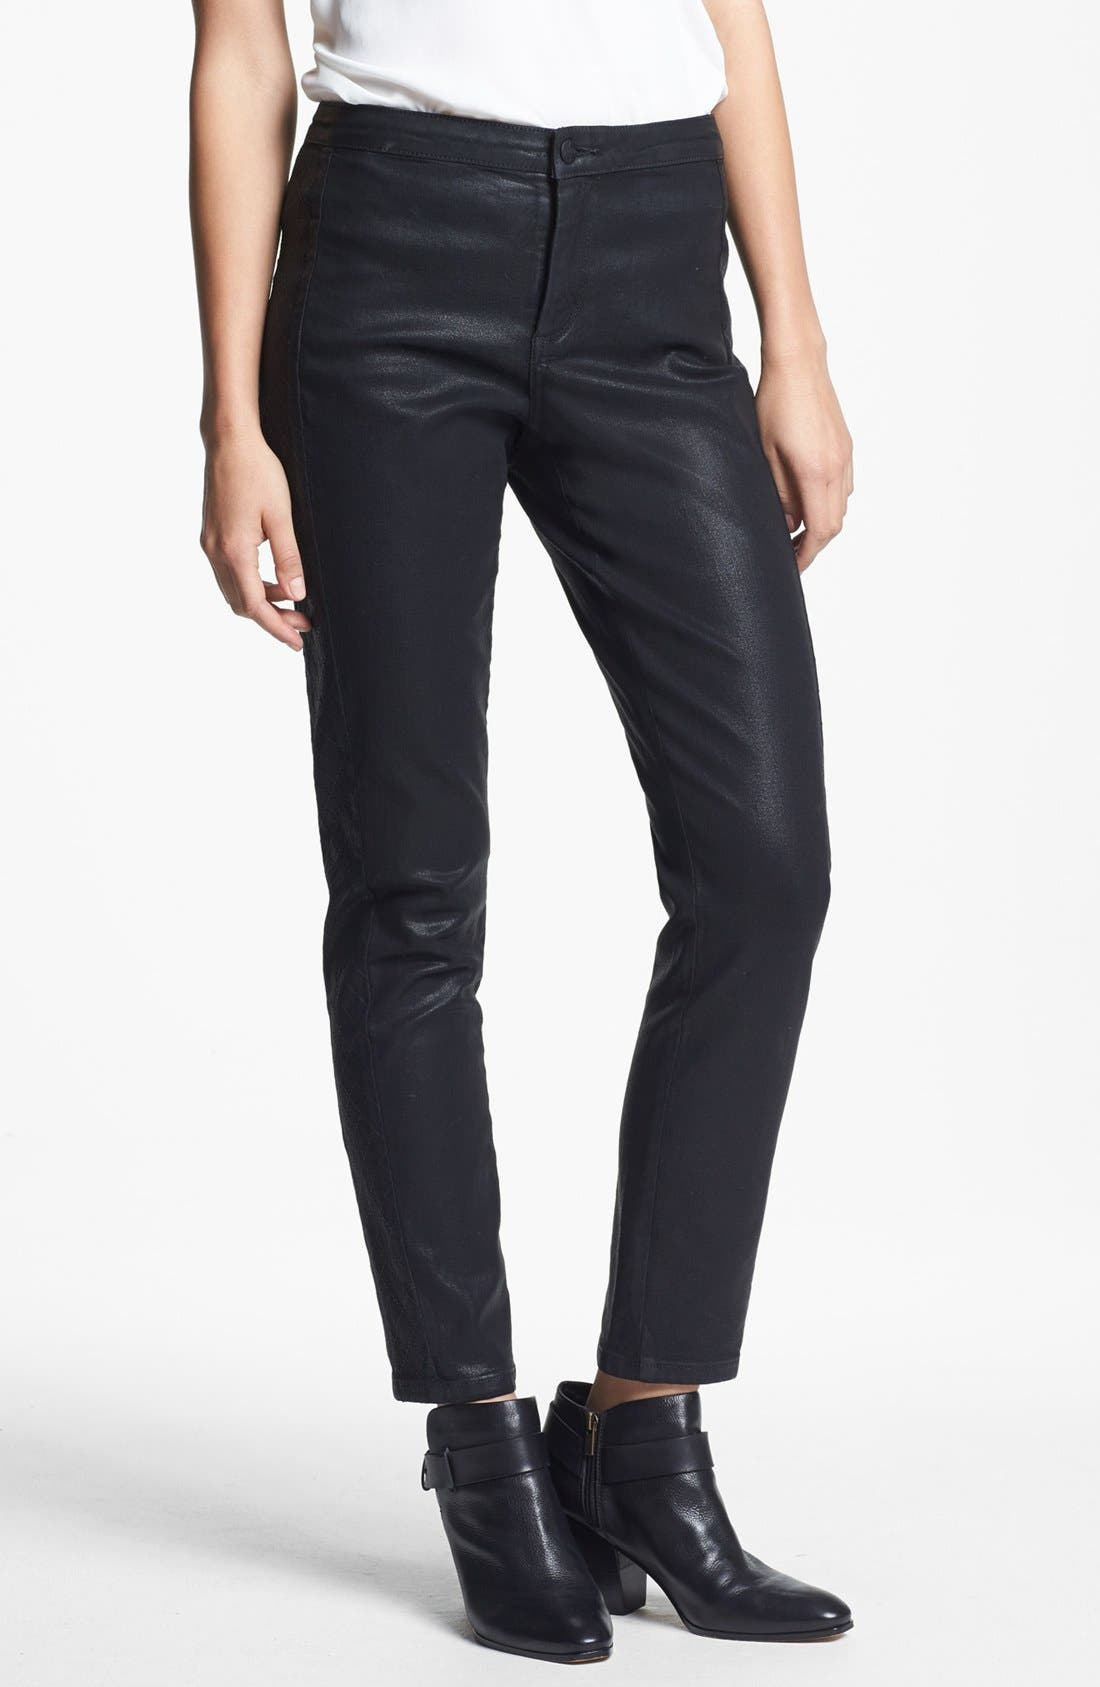 Alternate Image 1 Selected - NYDJ Coated Stretch Skinny Jeans (Black)